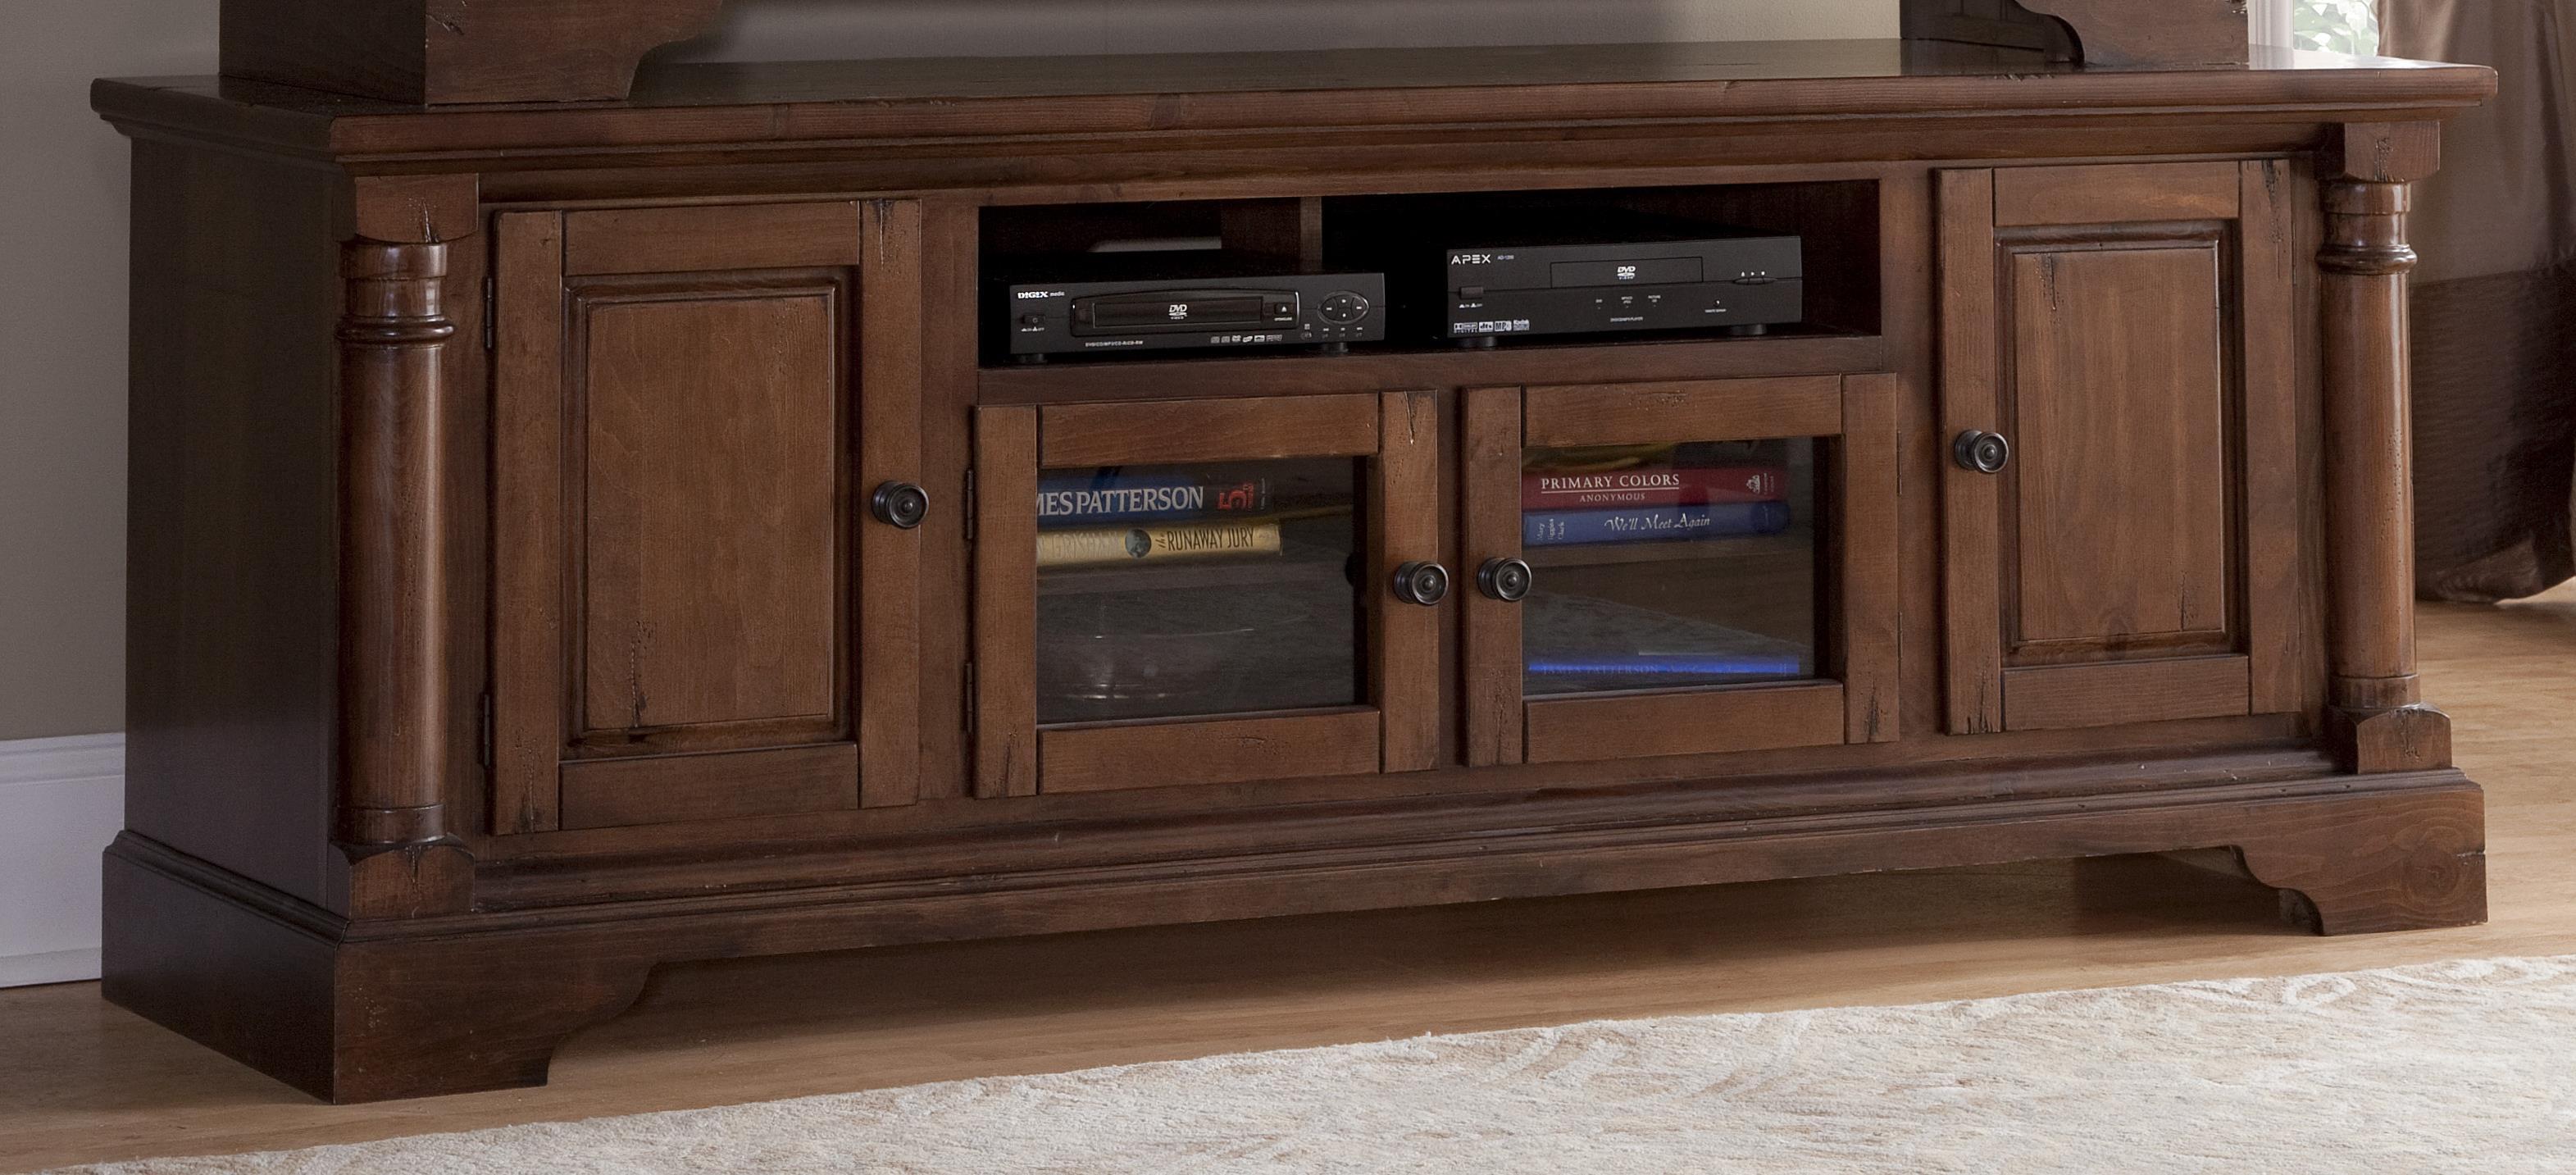 Progressive Furniture Gramercy Park 74 Inch Console - Item Number: P660E-74